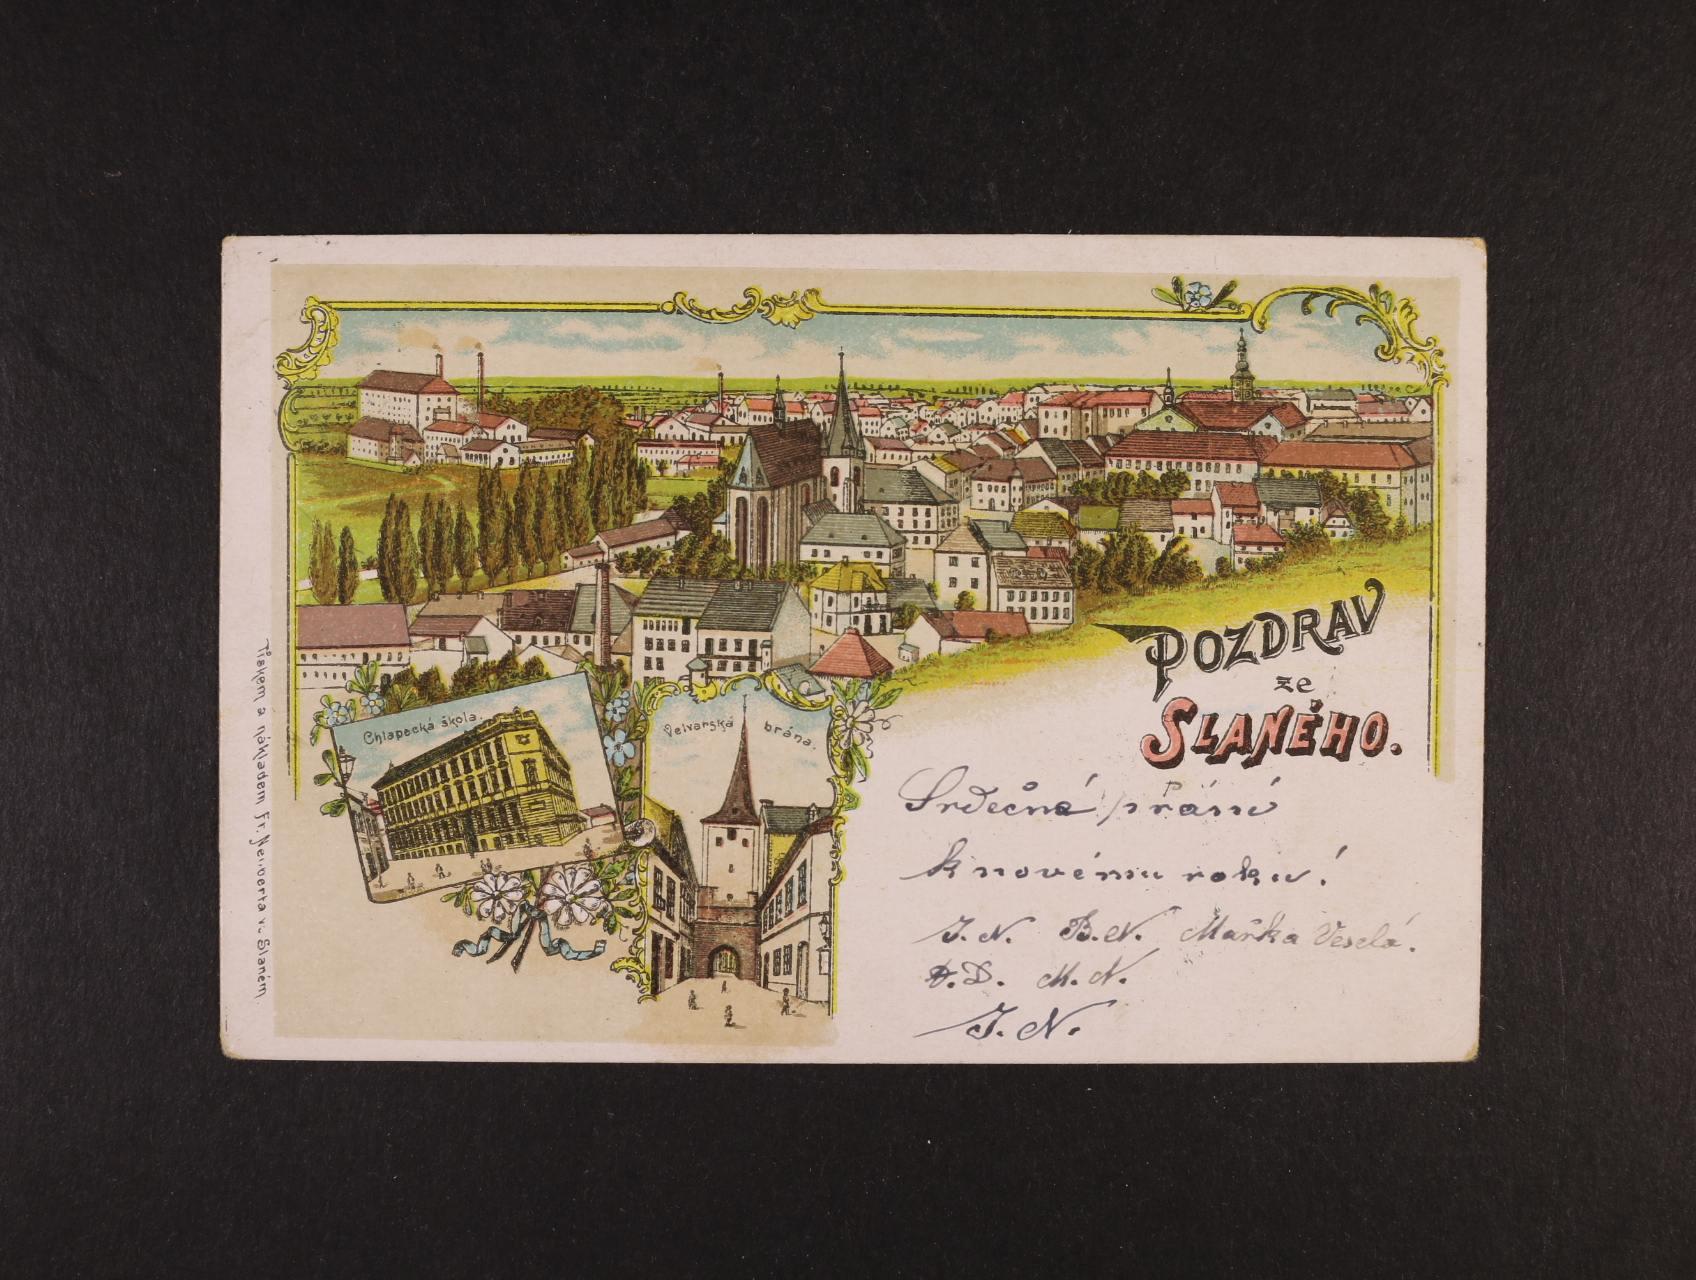 Slané - bar. litograf. koláž, dl. adresa, použitá 1901